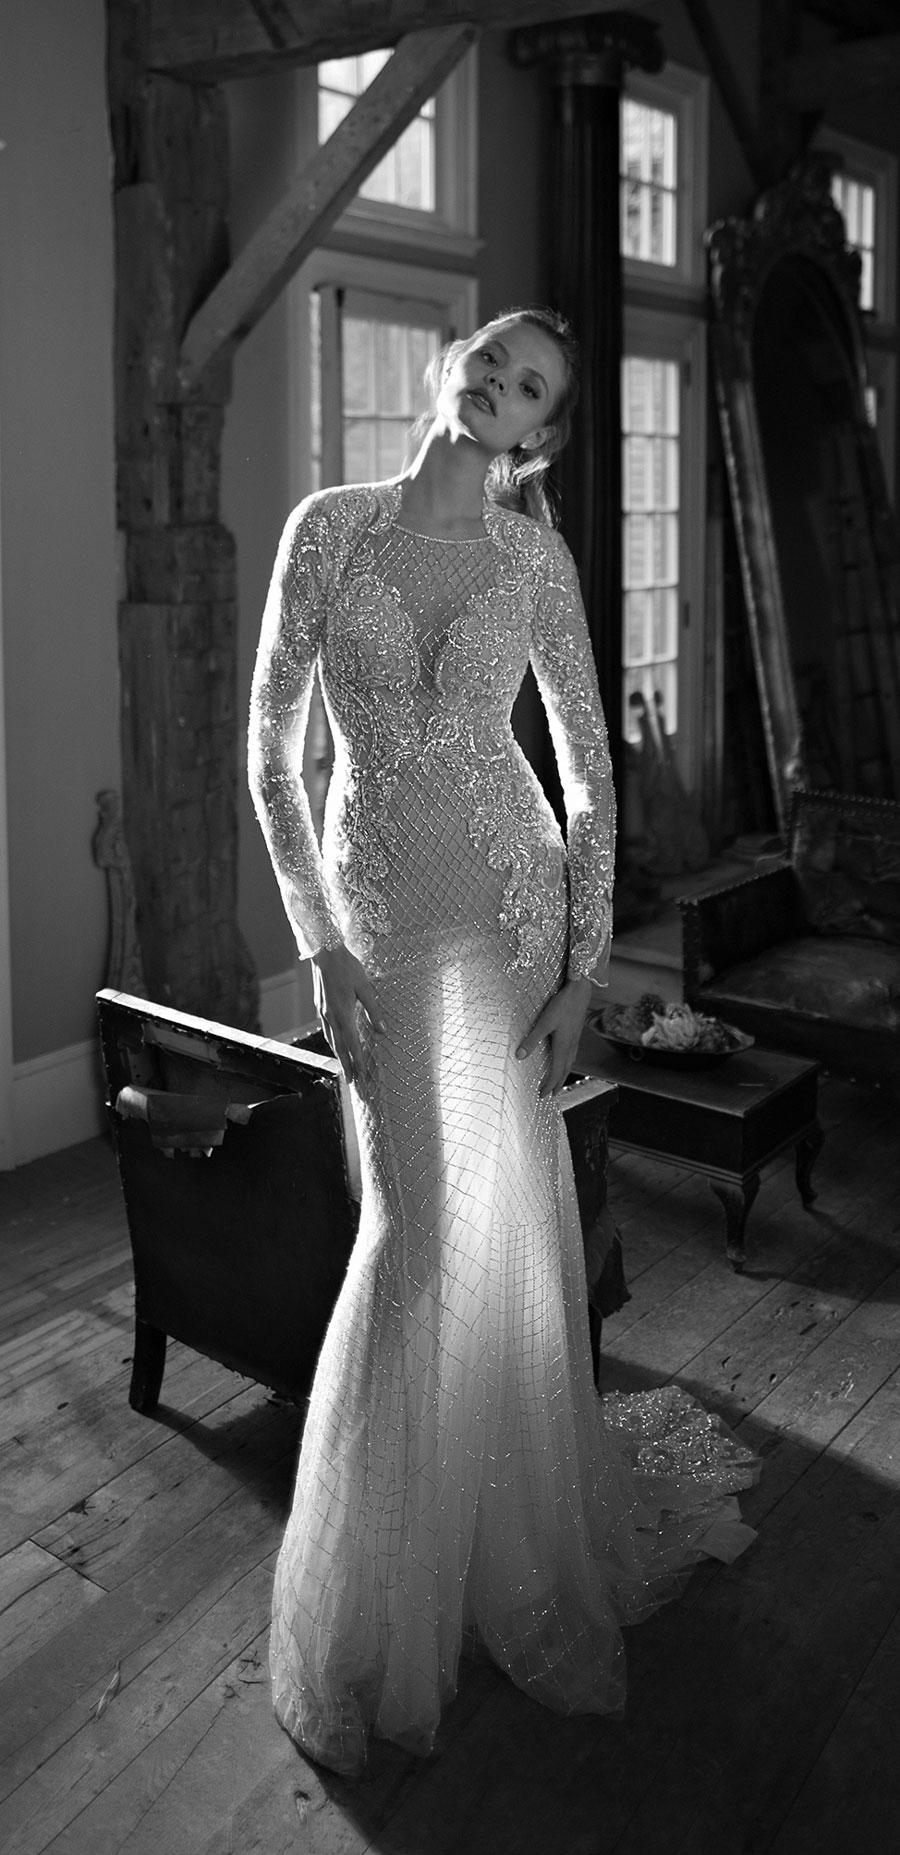 Berta-Bridal-Wedding-Dresses-Fall-Winter-2016-Bridal-Collection-00017